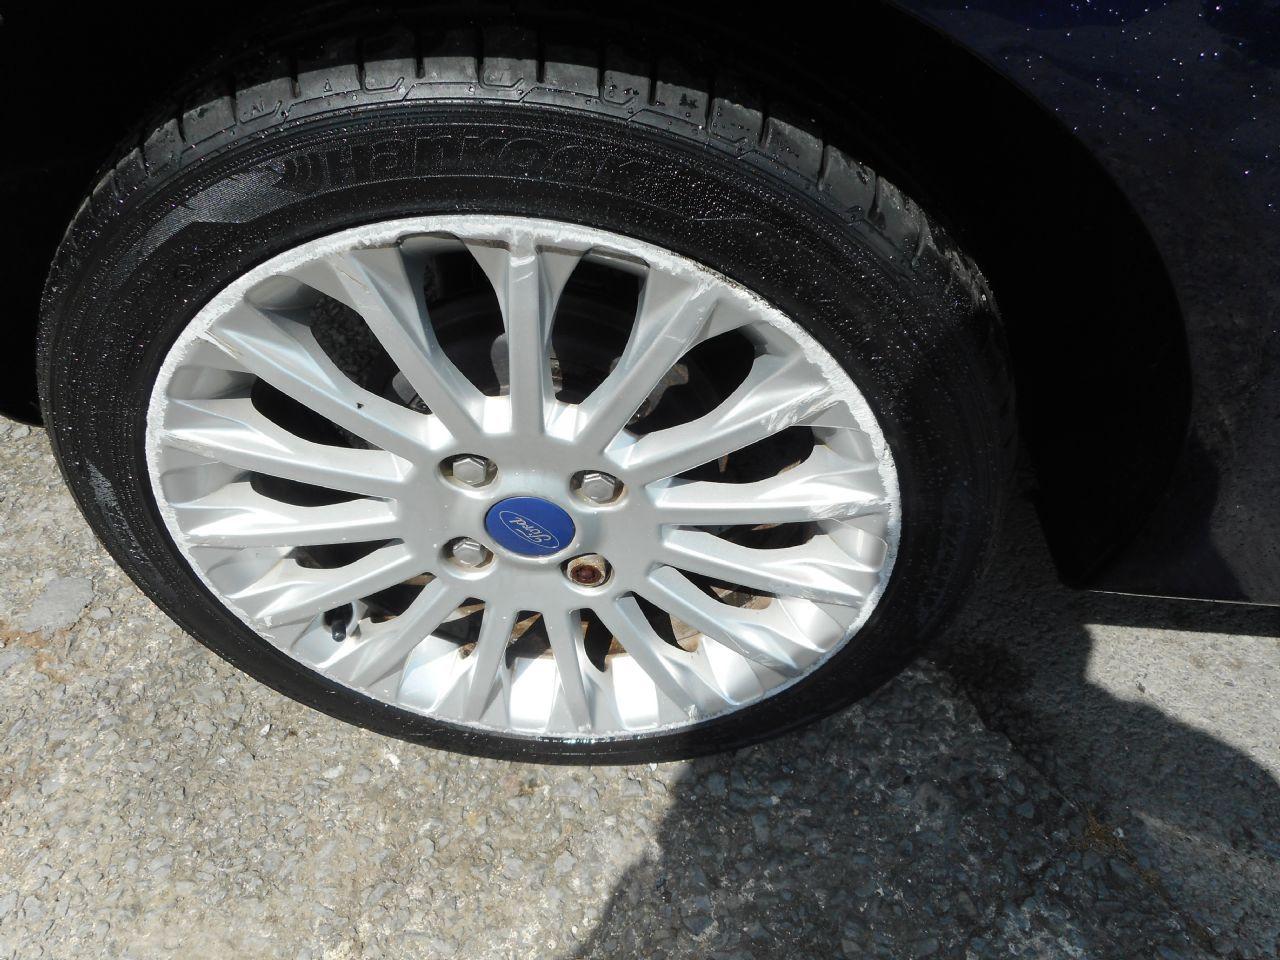 FORD Fiesta Titanium 1.4 096 Auto (2012) - Picture 5